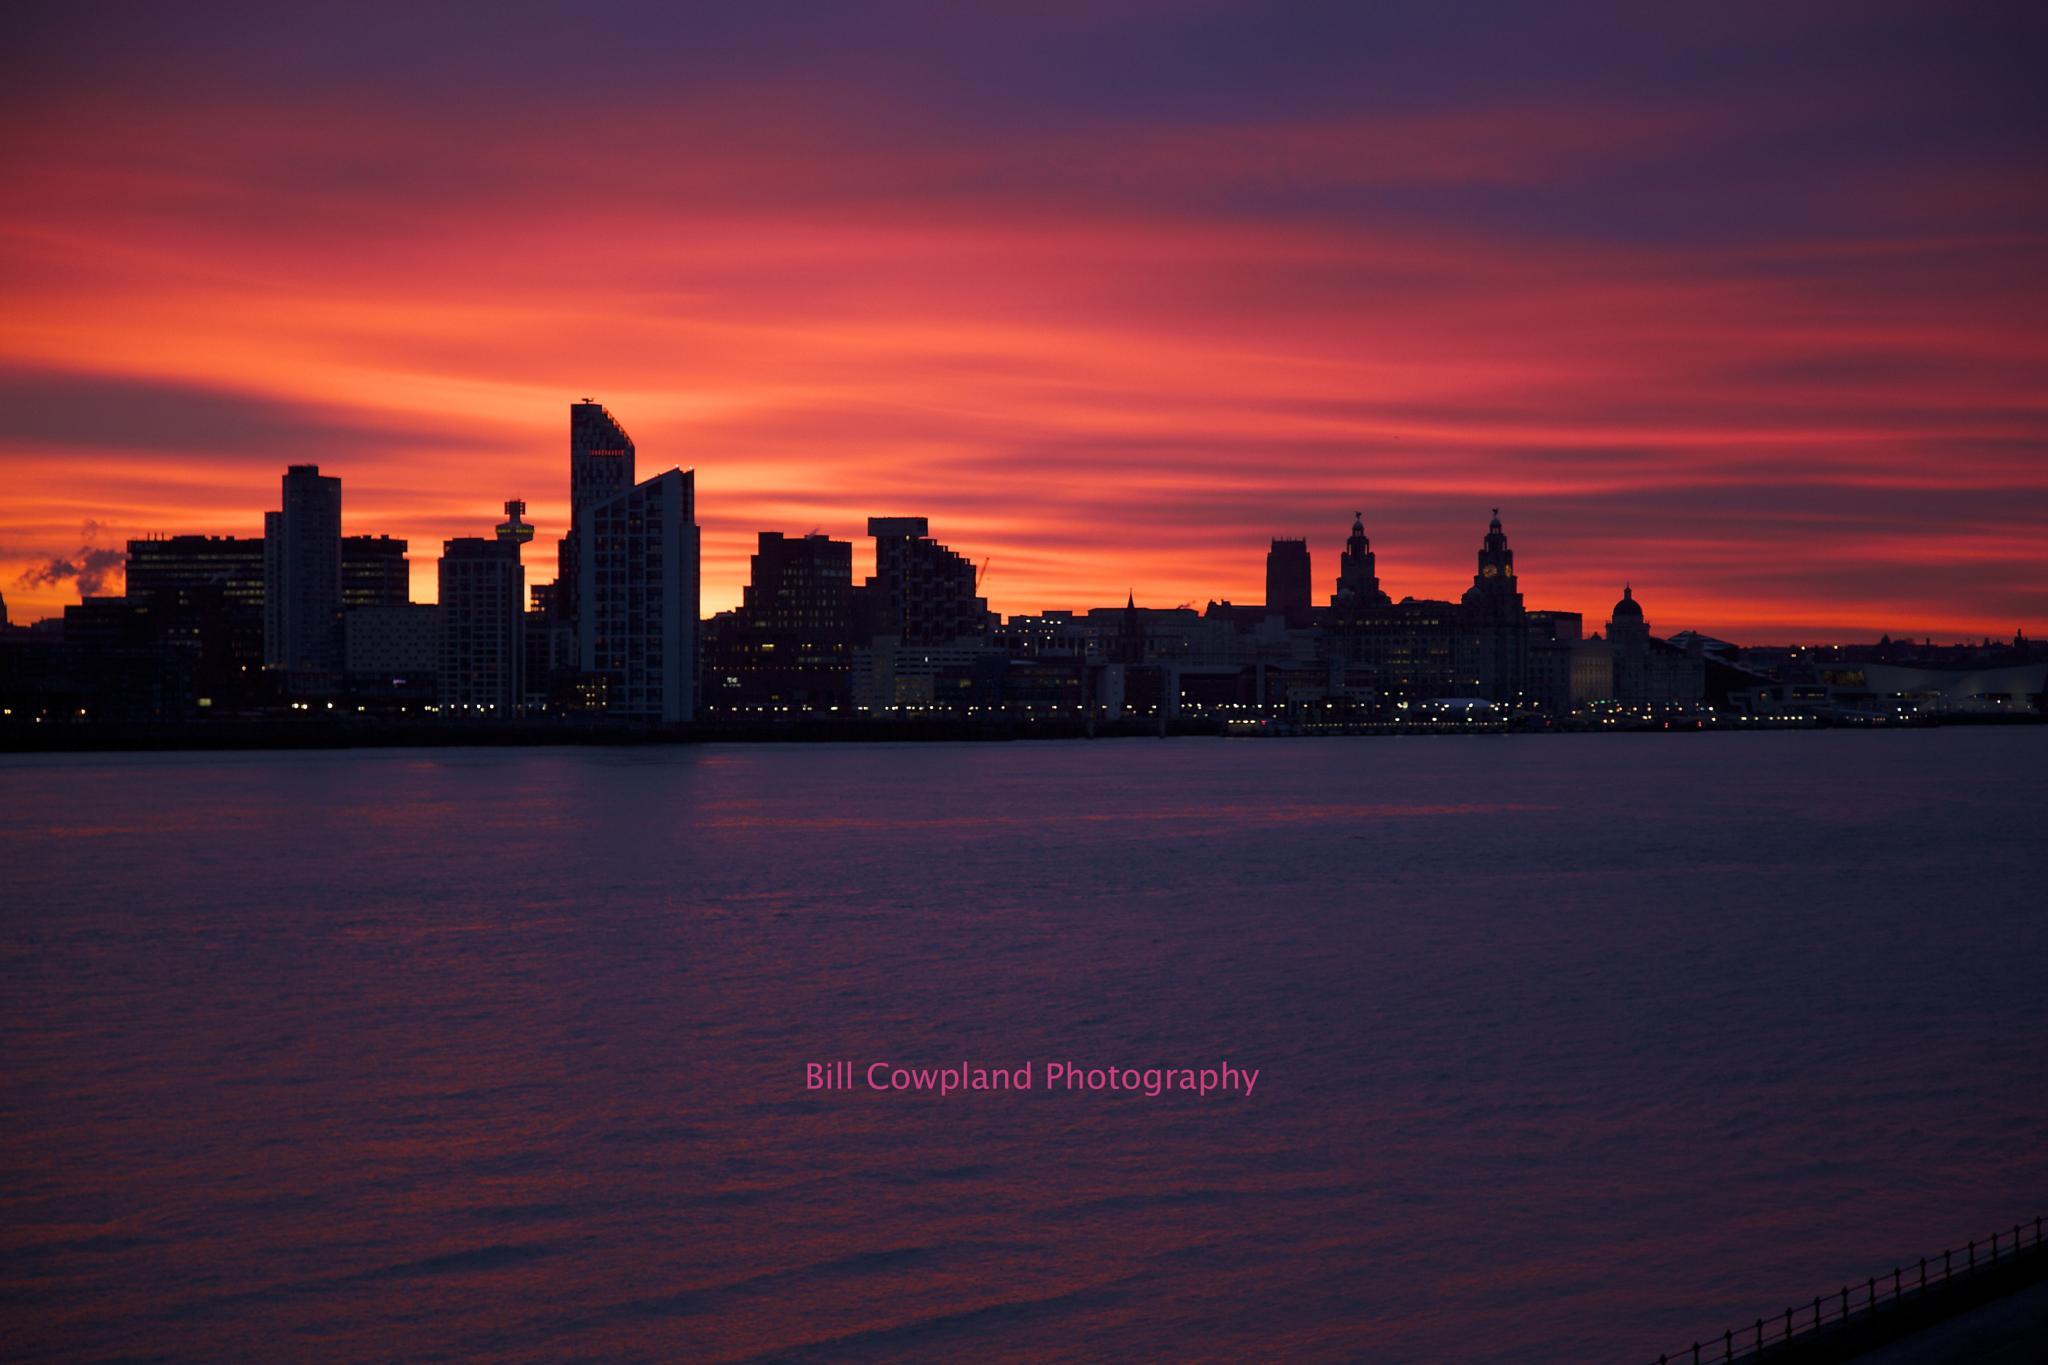 Red dawn by Bill Cowpland